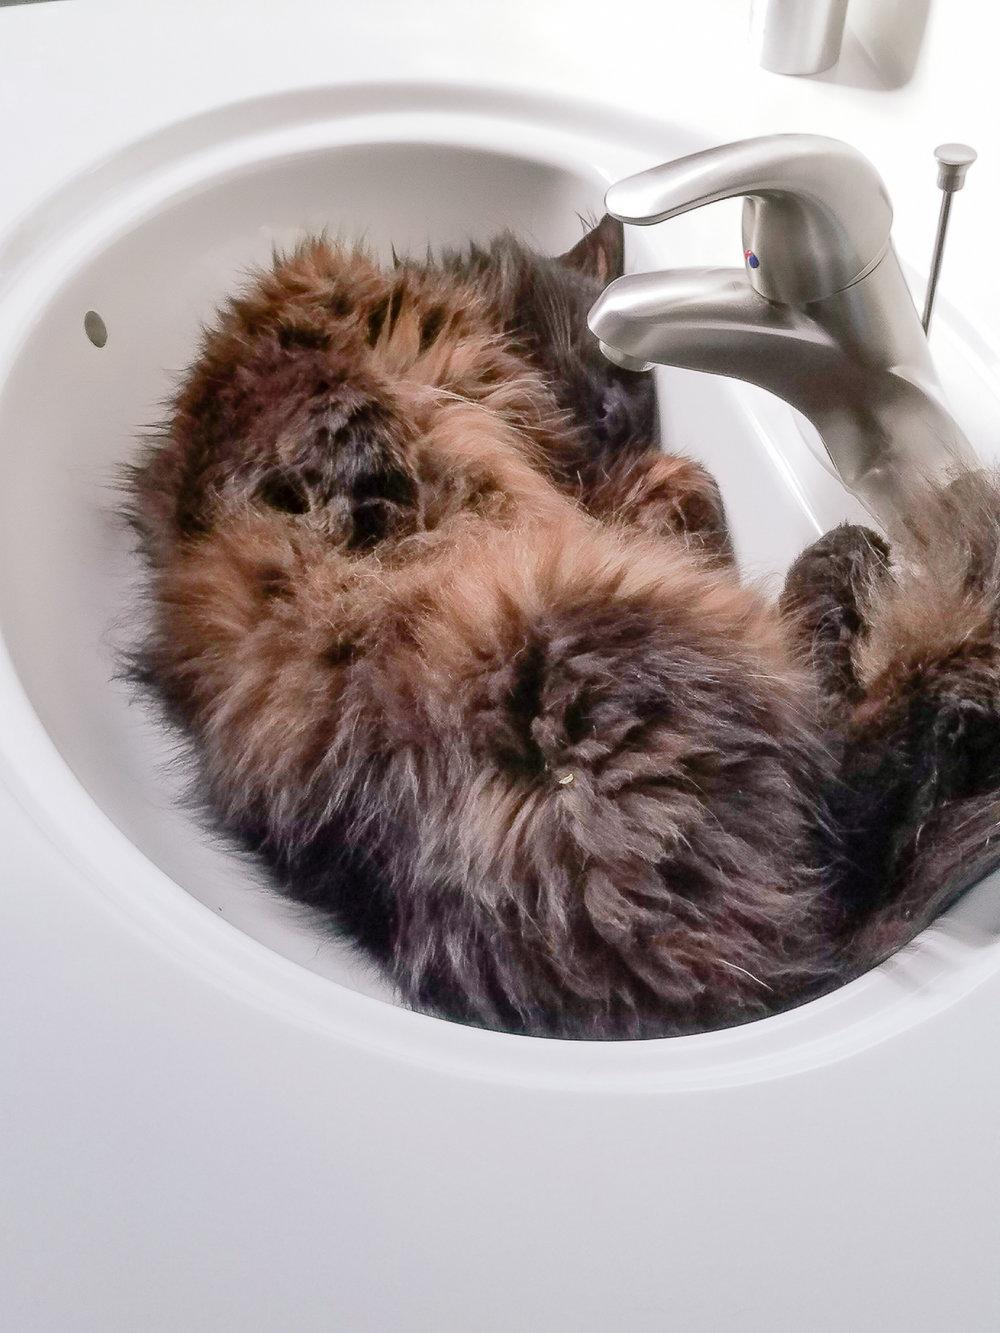 Cat-Sink-AT-Plumbing-Roanoke-Virginia